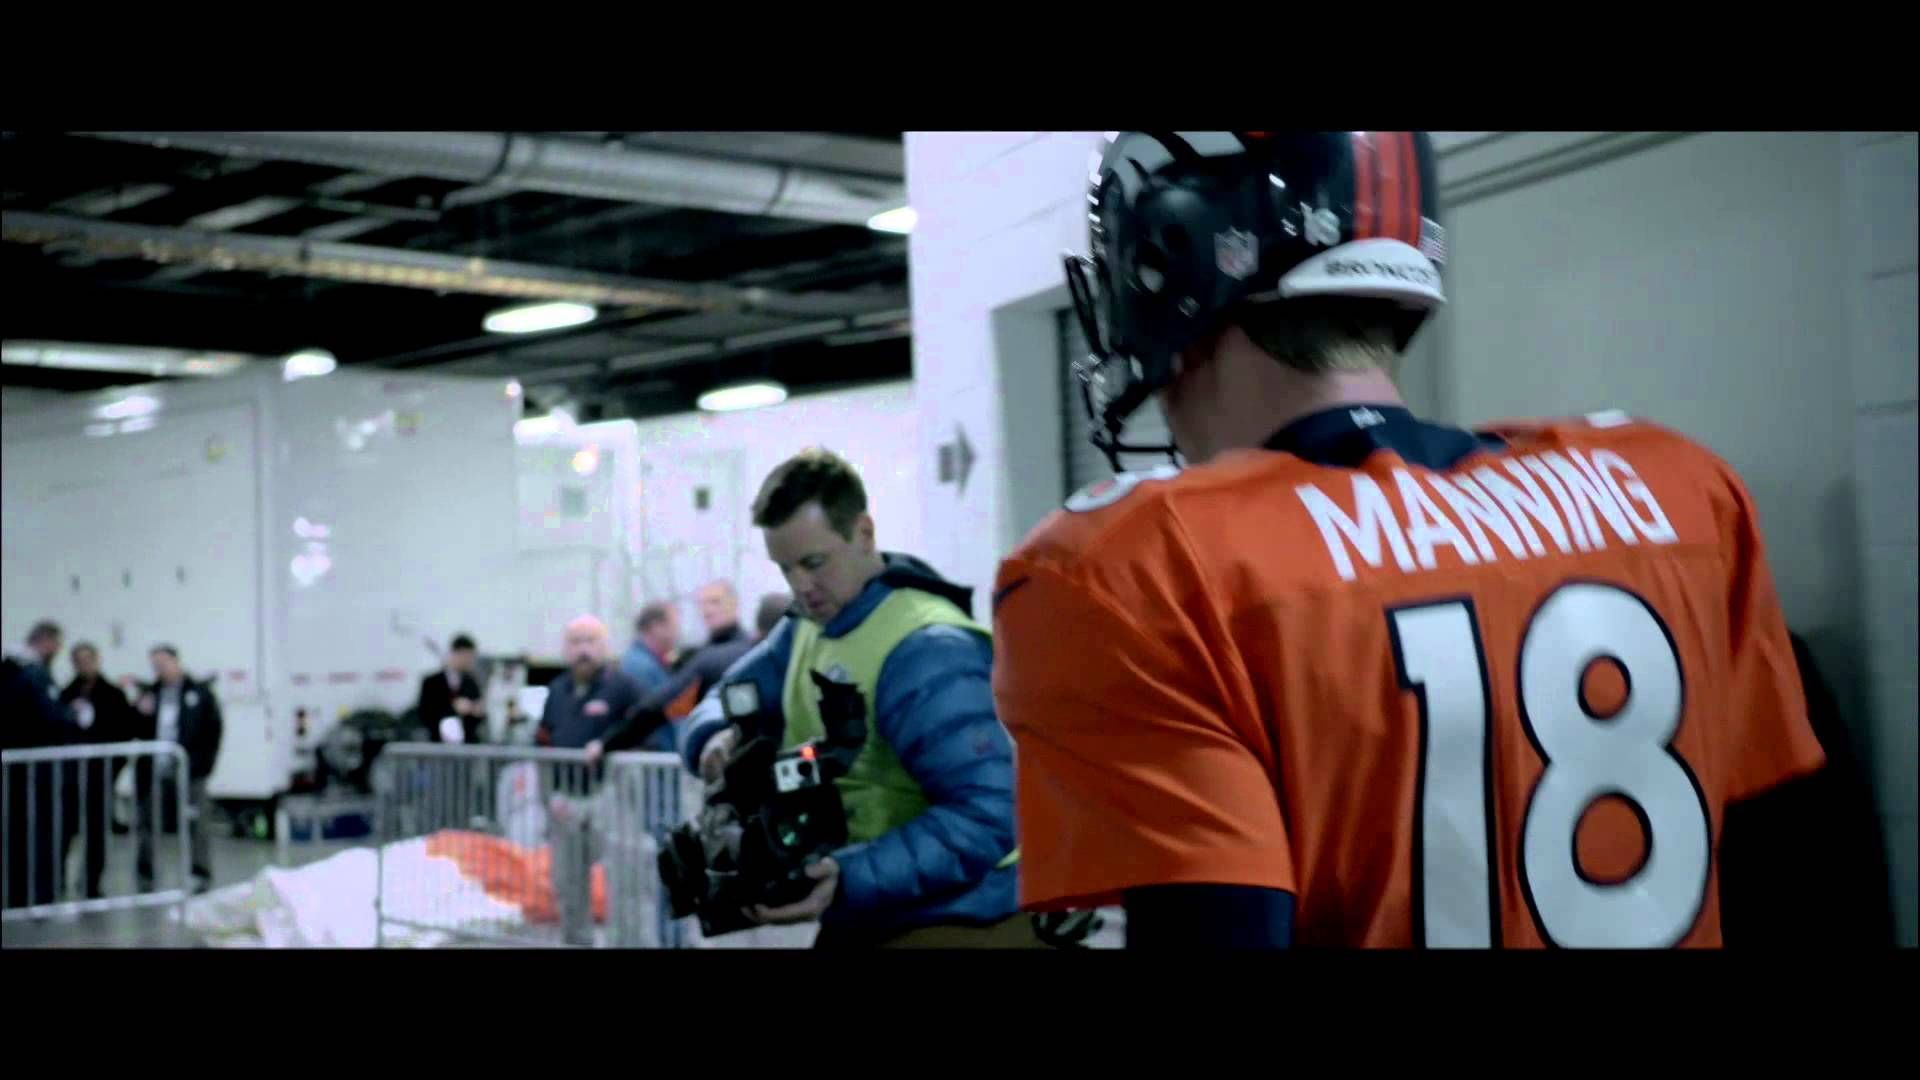 Espn Monday Night Football Manning Monday Night Football Espn